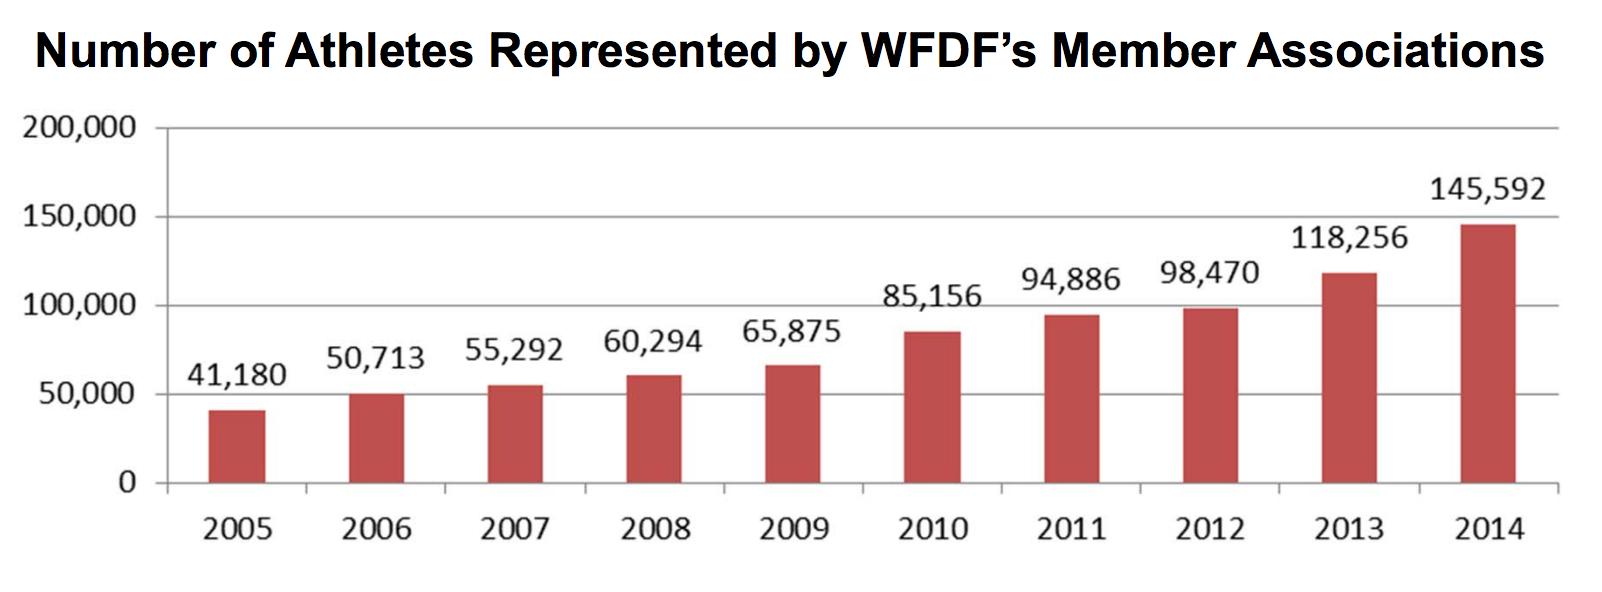 WFDF Membership Base